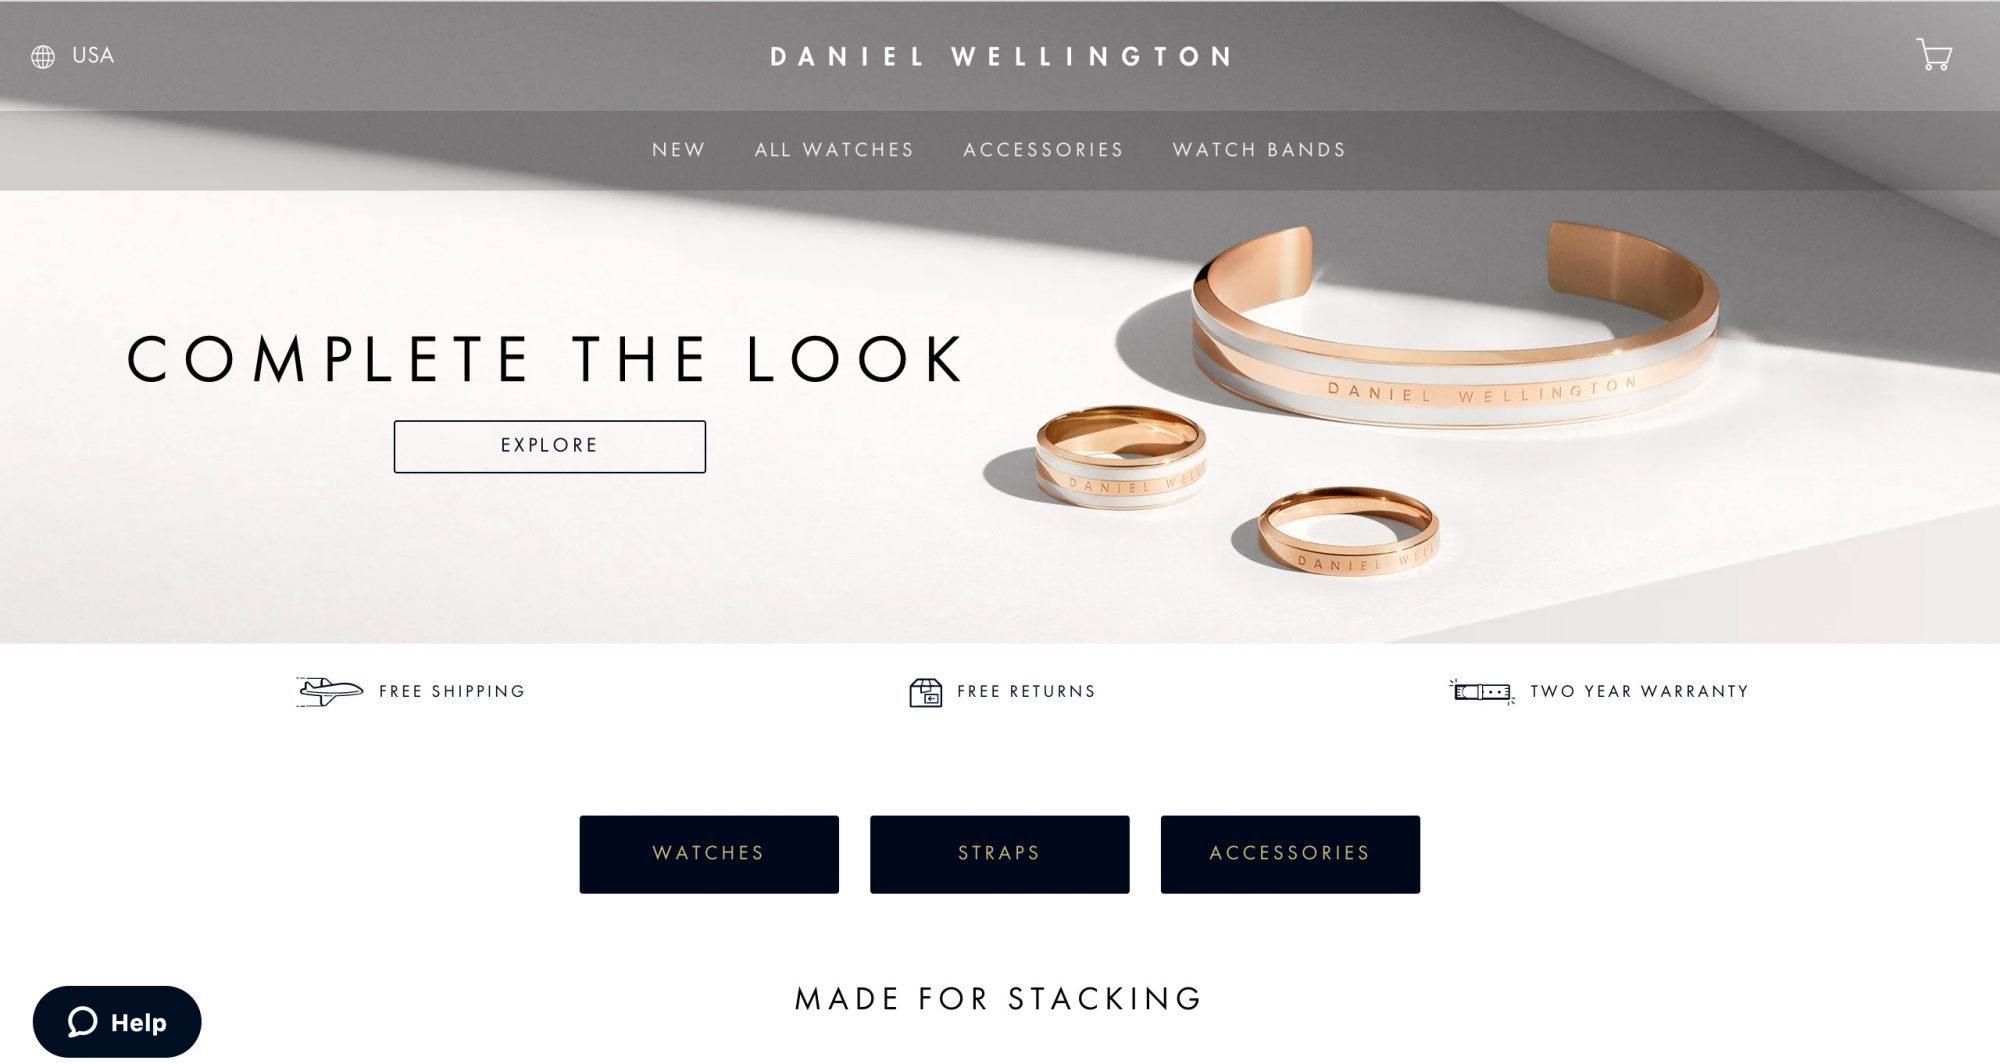 Daniel Wellington Luxury Watch E-commerce Company Website Homepage